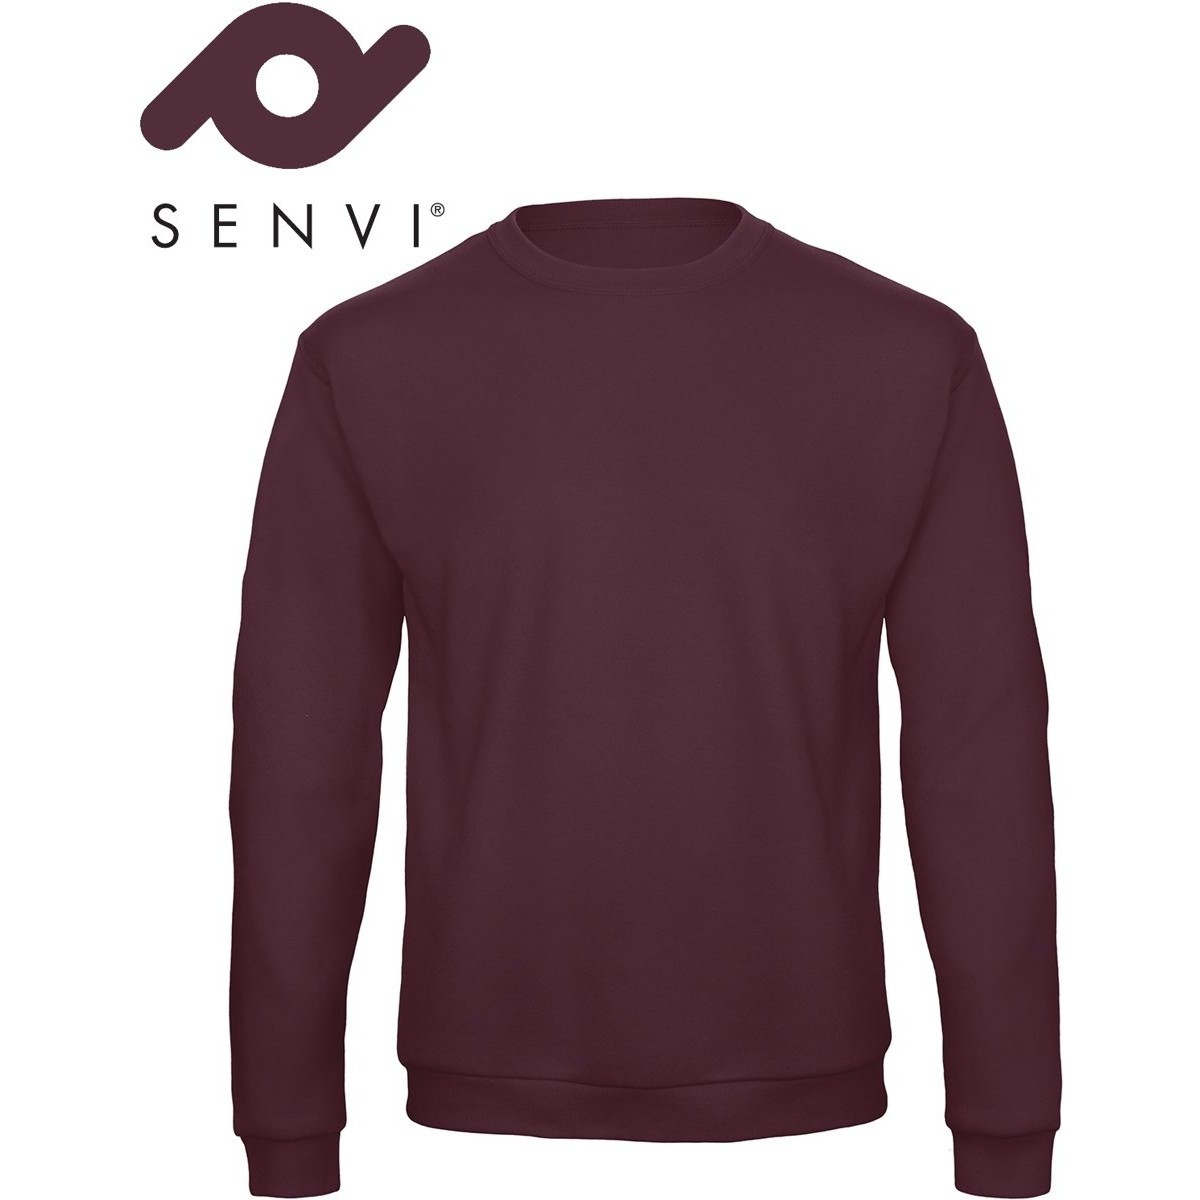 Senvi Basic Sweater (Kleur: Burgundy) - (Maat S)